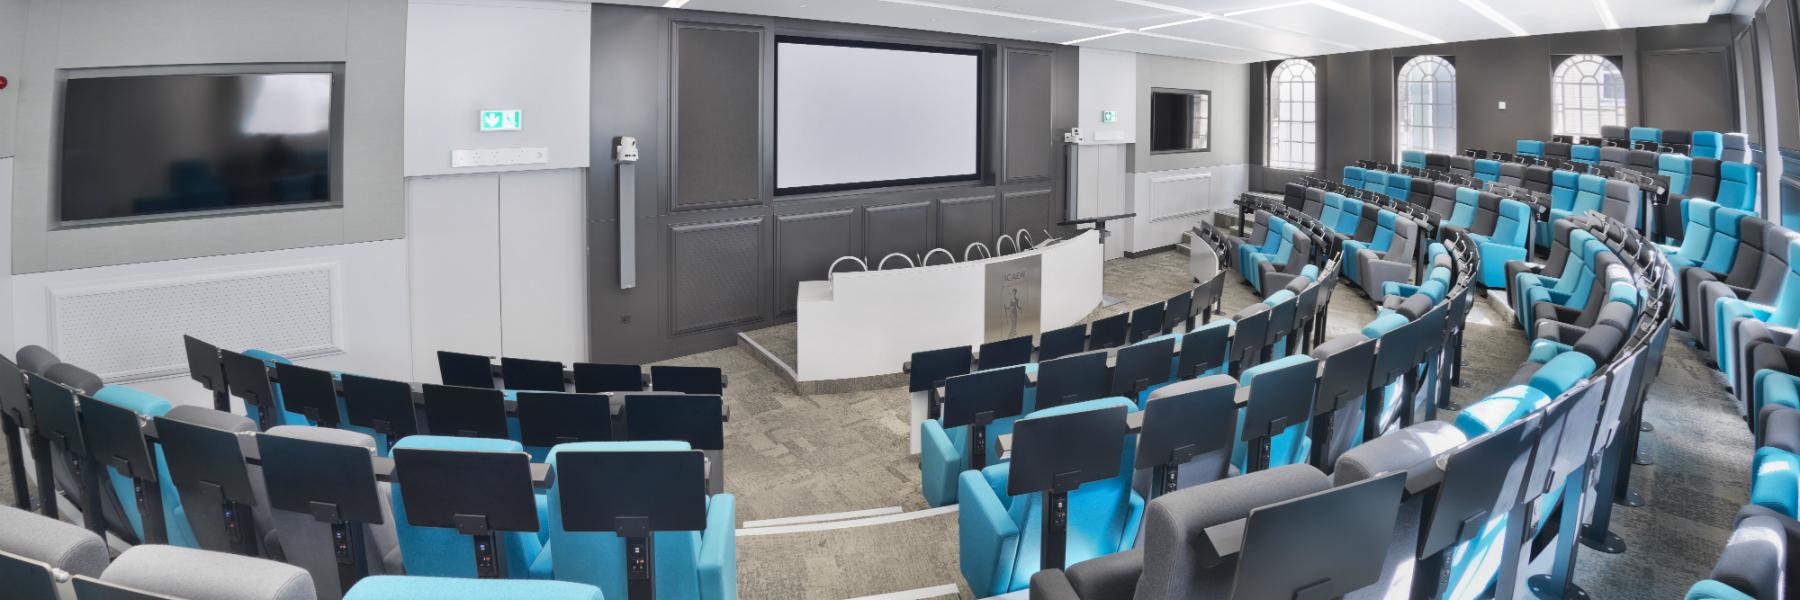 one-moorgate-place-auditorium.jpg